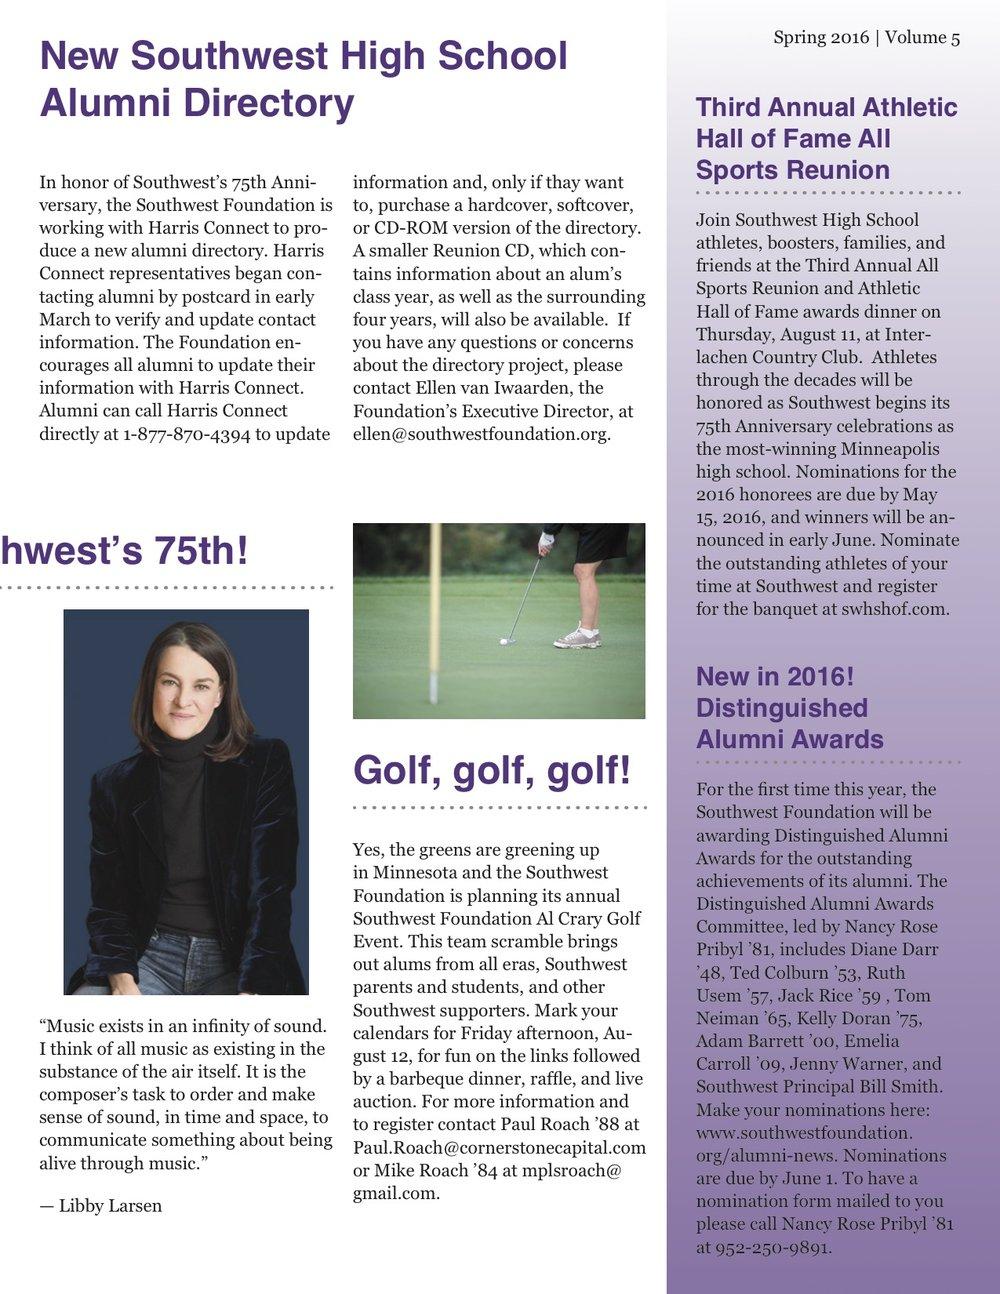 Spring 2016 Newsletter Page 3.jpg